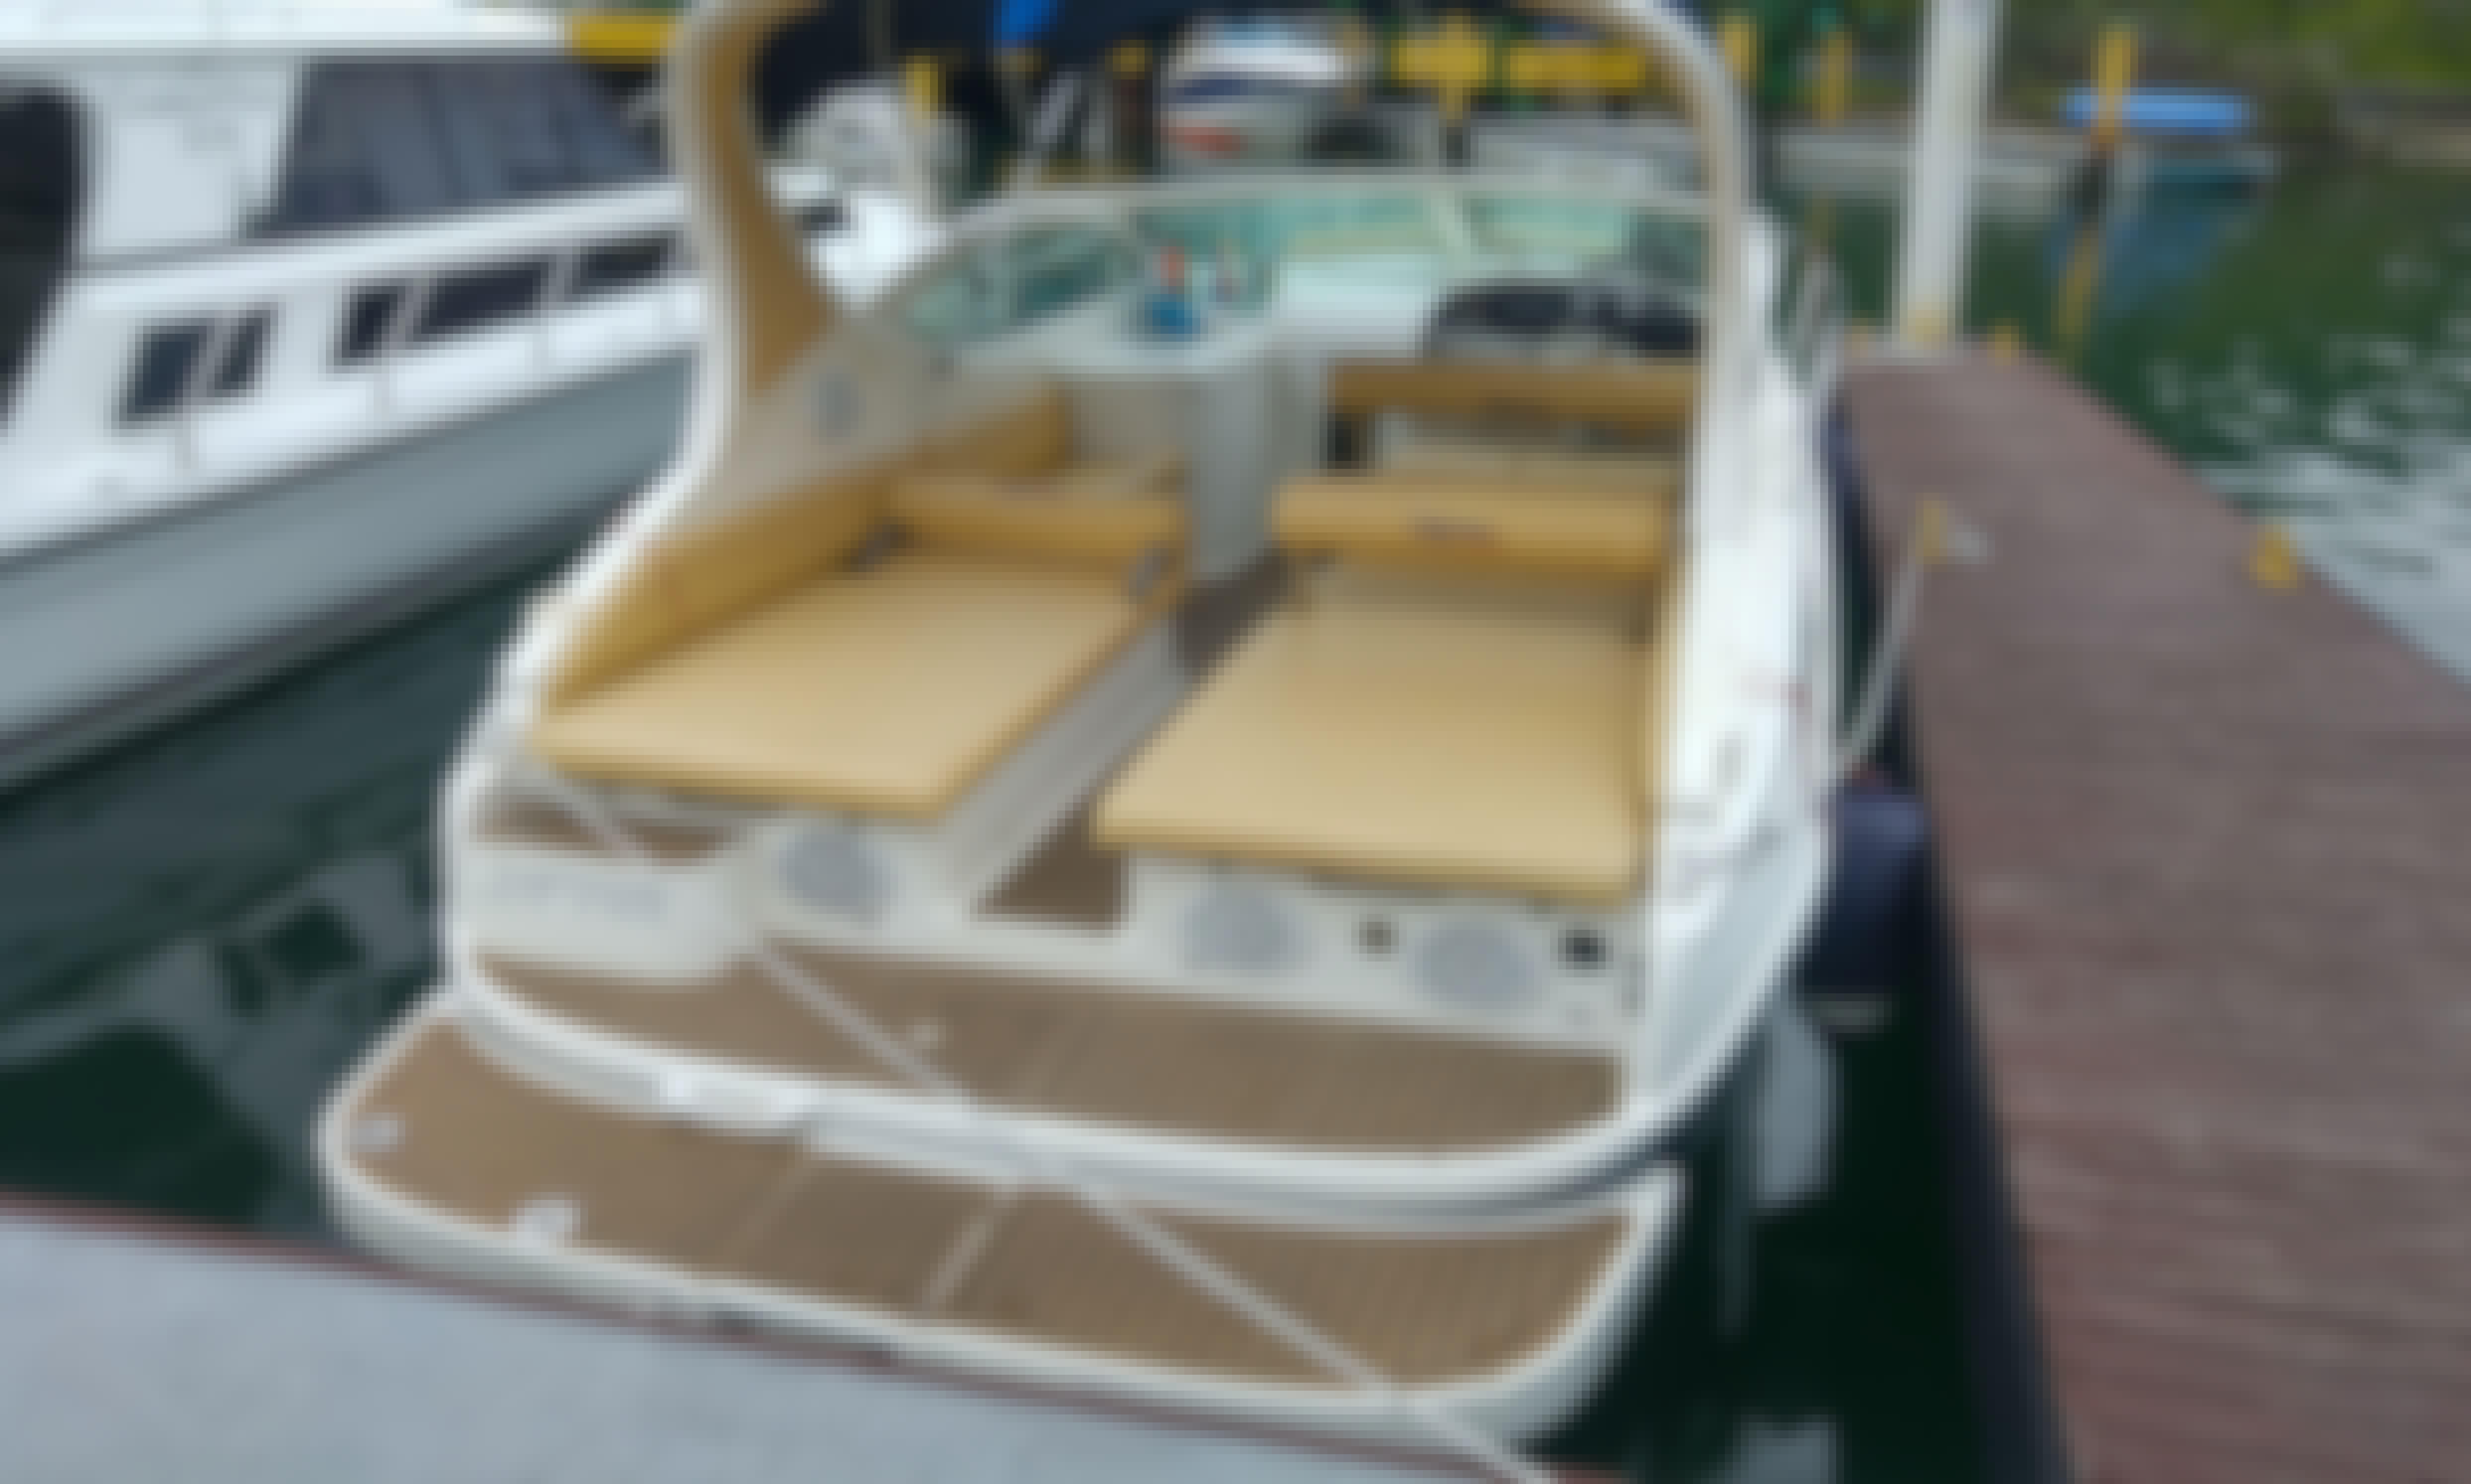 Motor Yacht rental in Angra dos Reis.